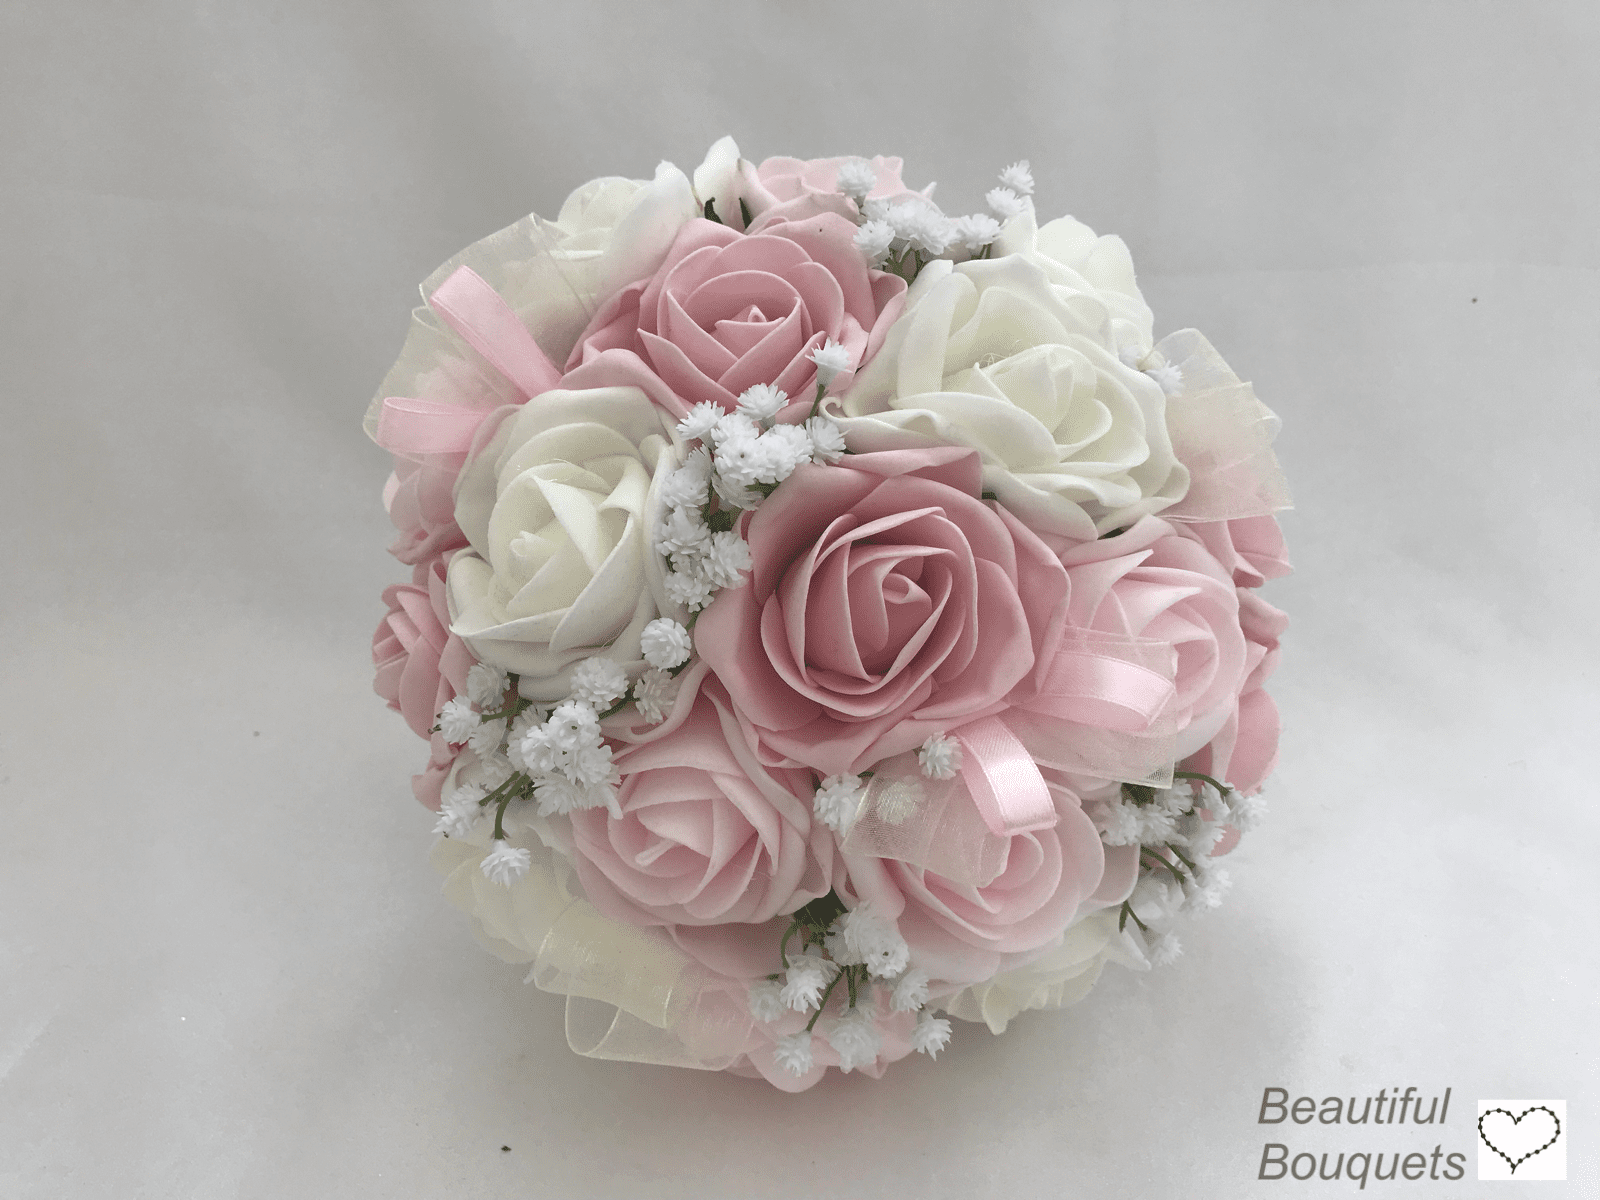 Bridesmaid Wedding Bouquets Artificial Flowers Bride Rose Posy in Hot Pink